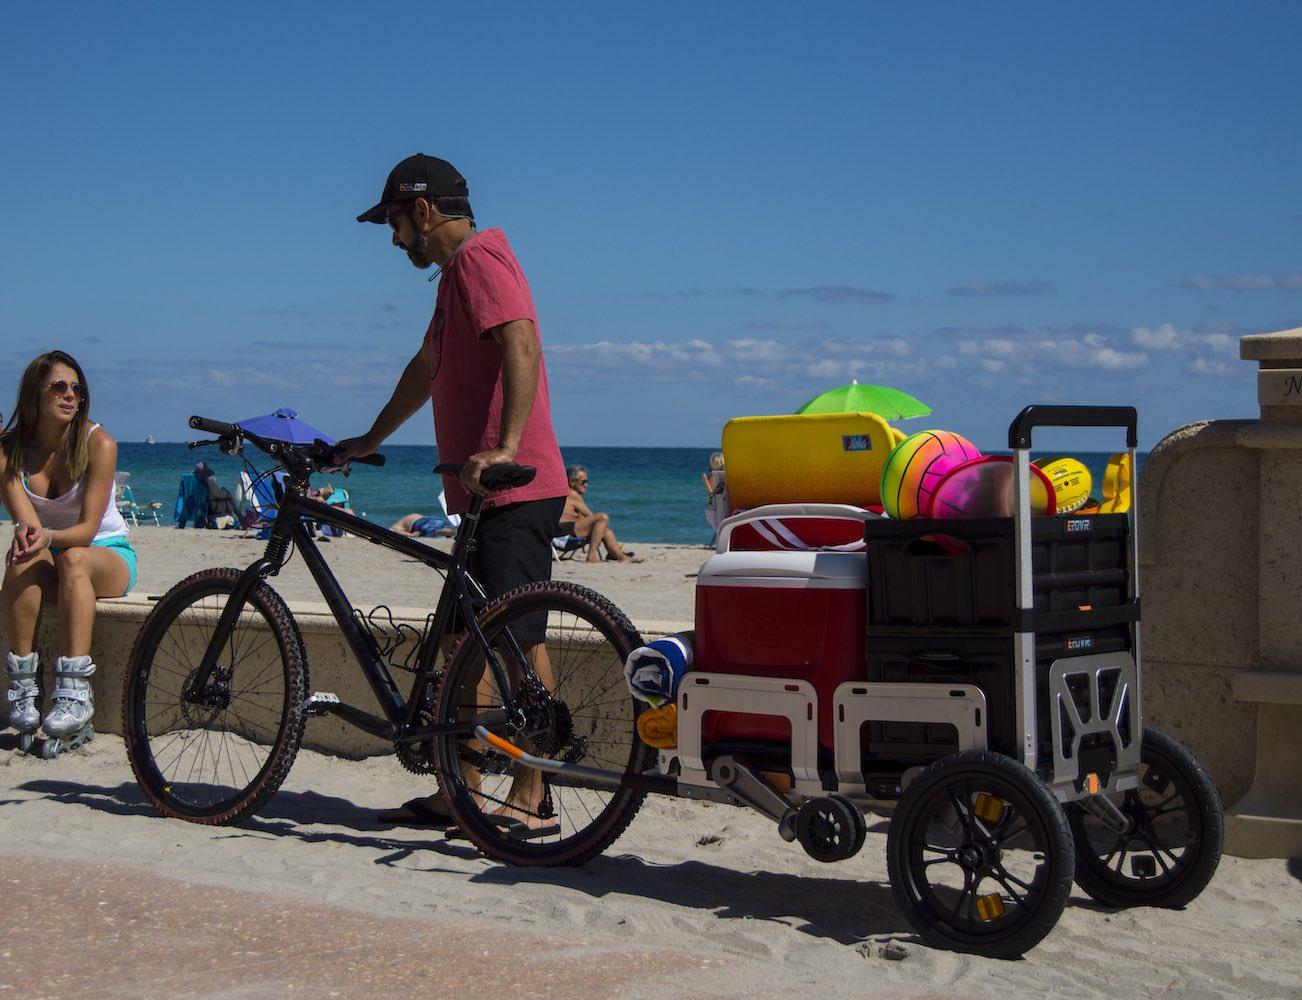 EROVR – A Transformable Dolly, Wagon, & Cart